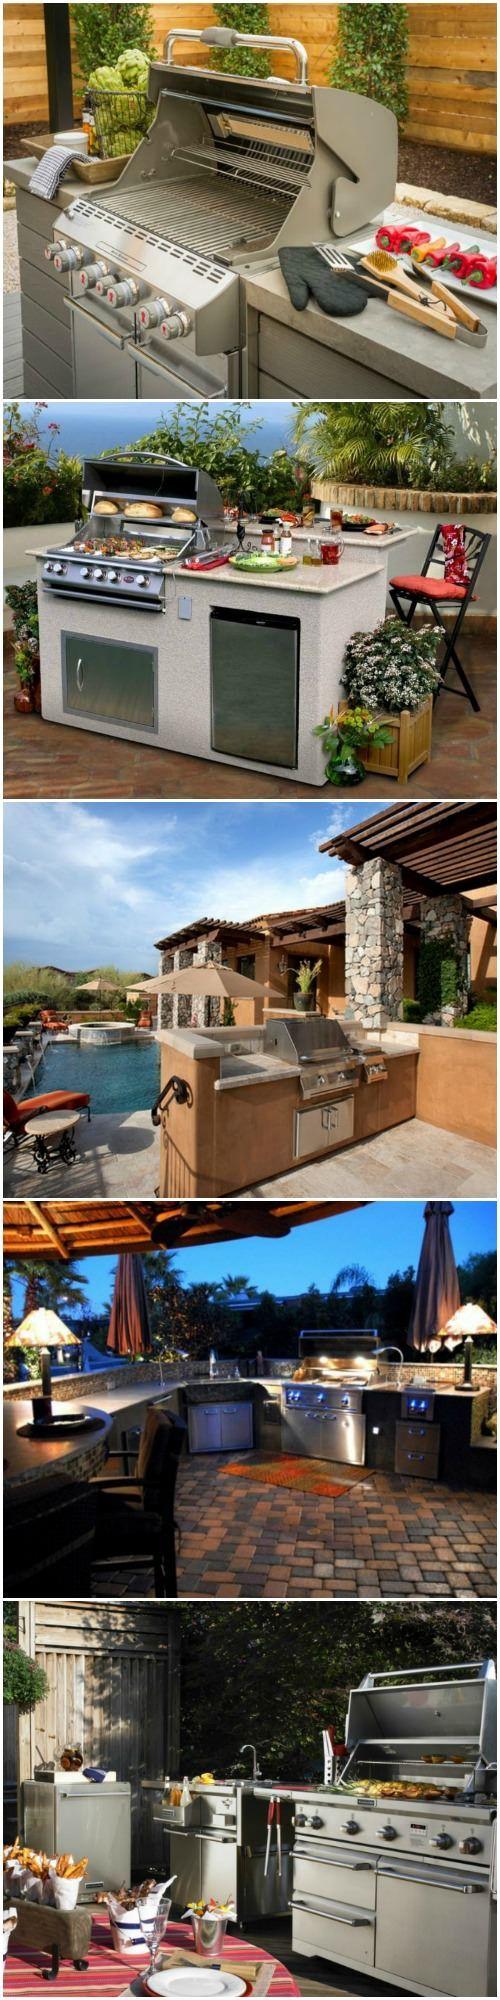 Top 20 DIY Outdoor Kitchen Ideas - patio-outdoor-furniture, grills-bbq-firepits